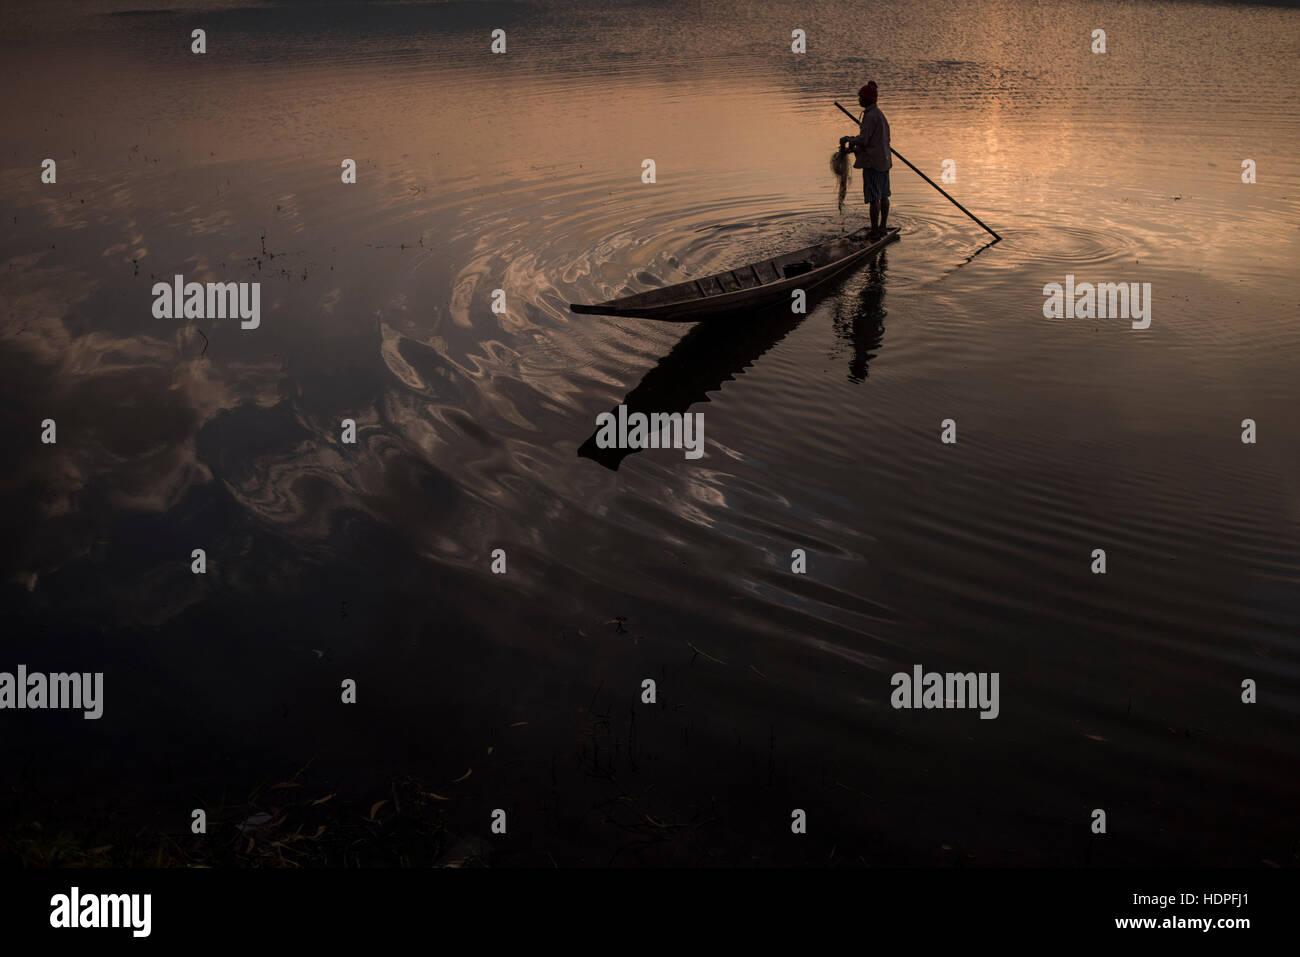 Fisherman working at the Tharzi Pond in Nyaungshwe, Myanmar. - Stock Image